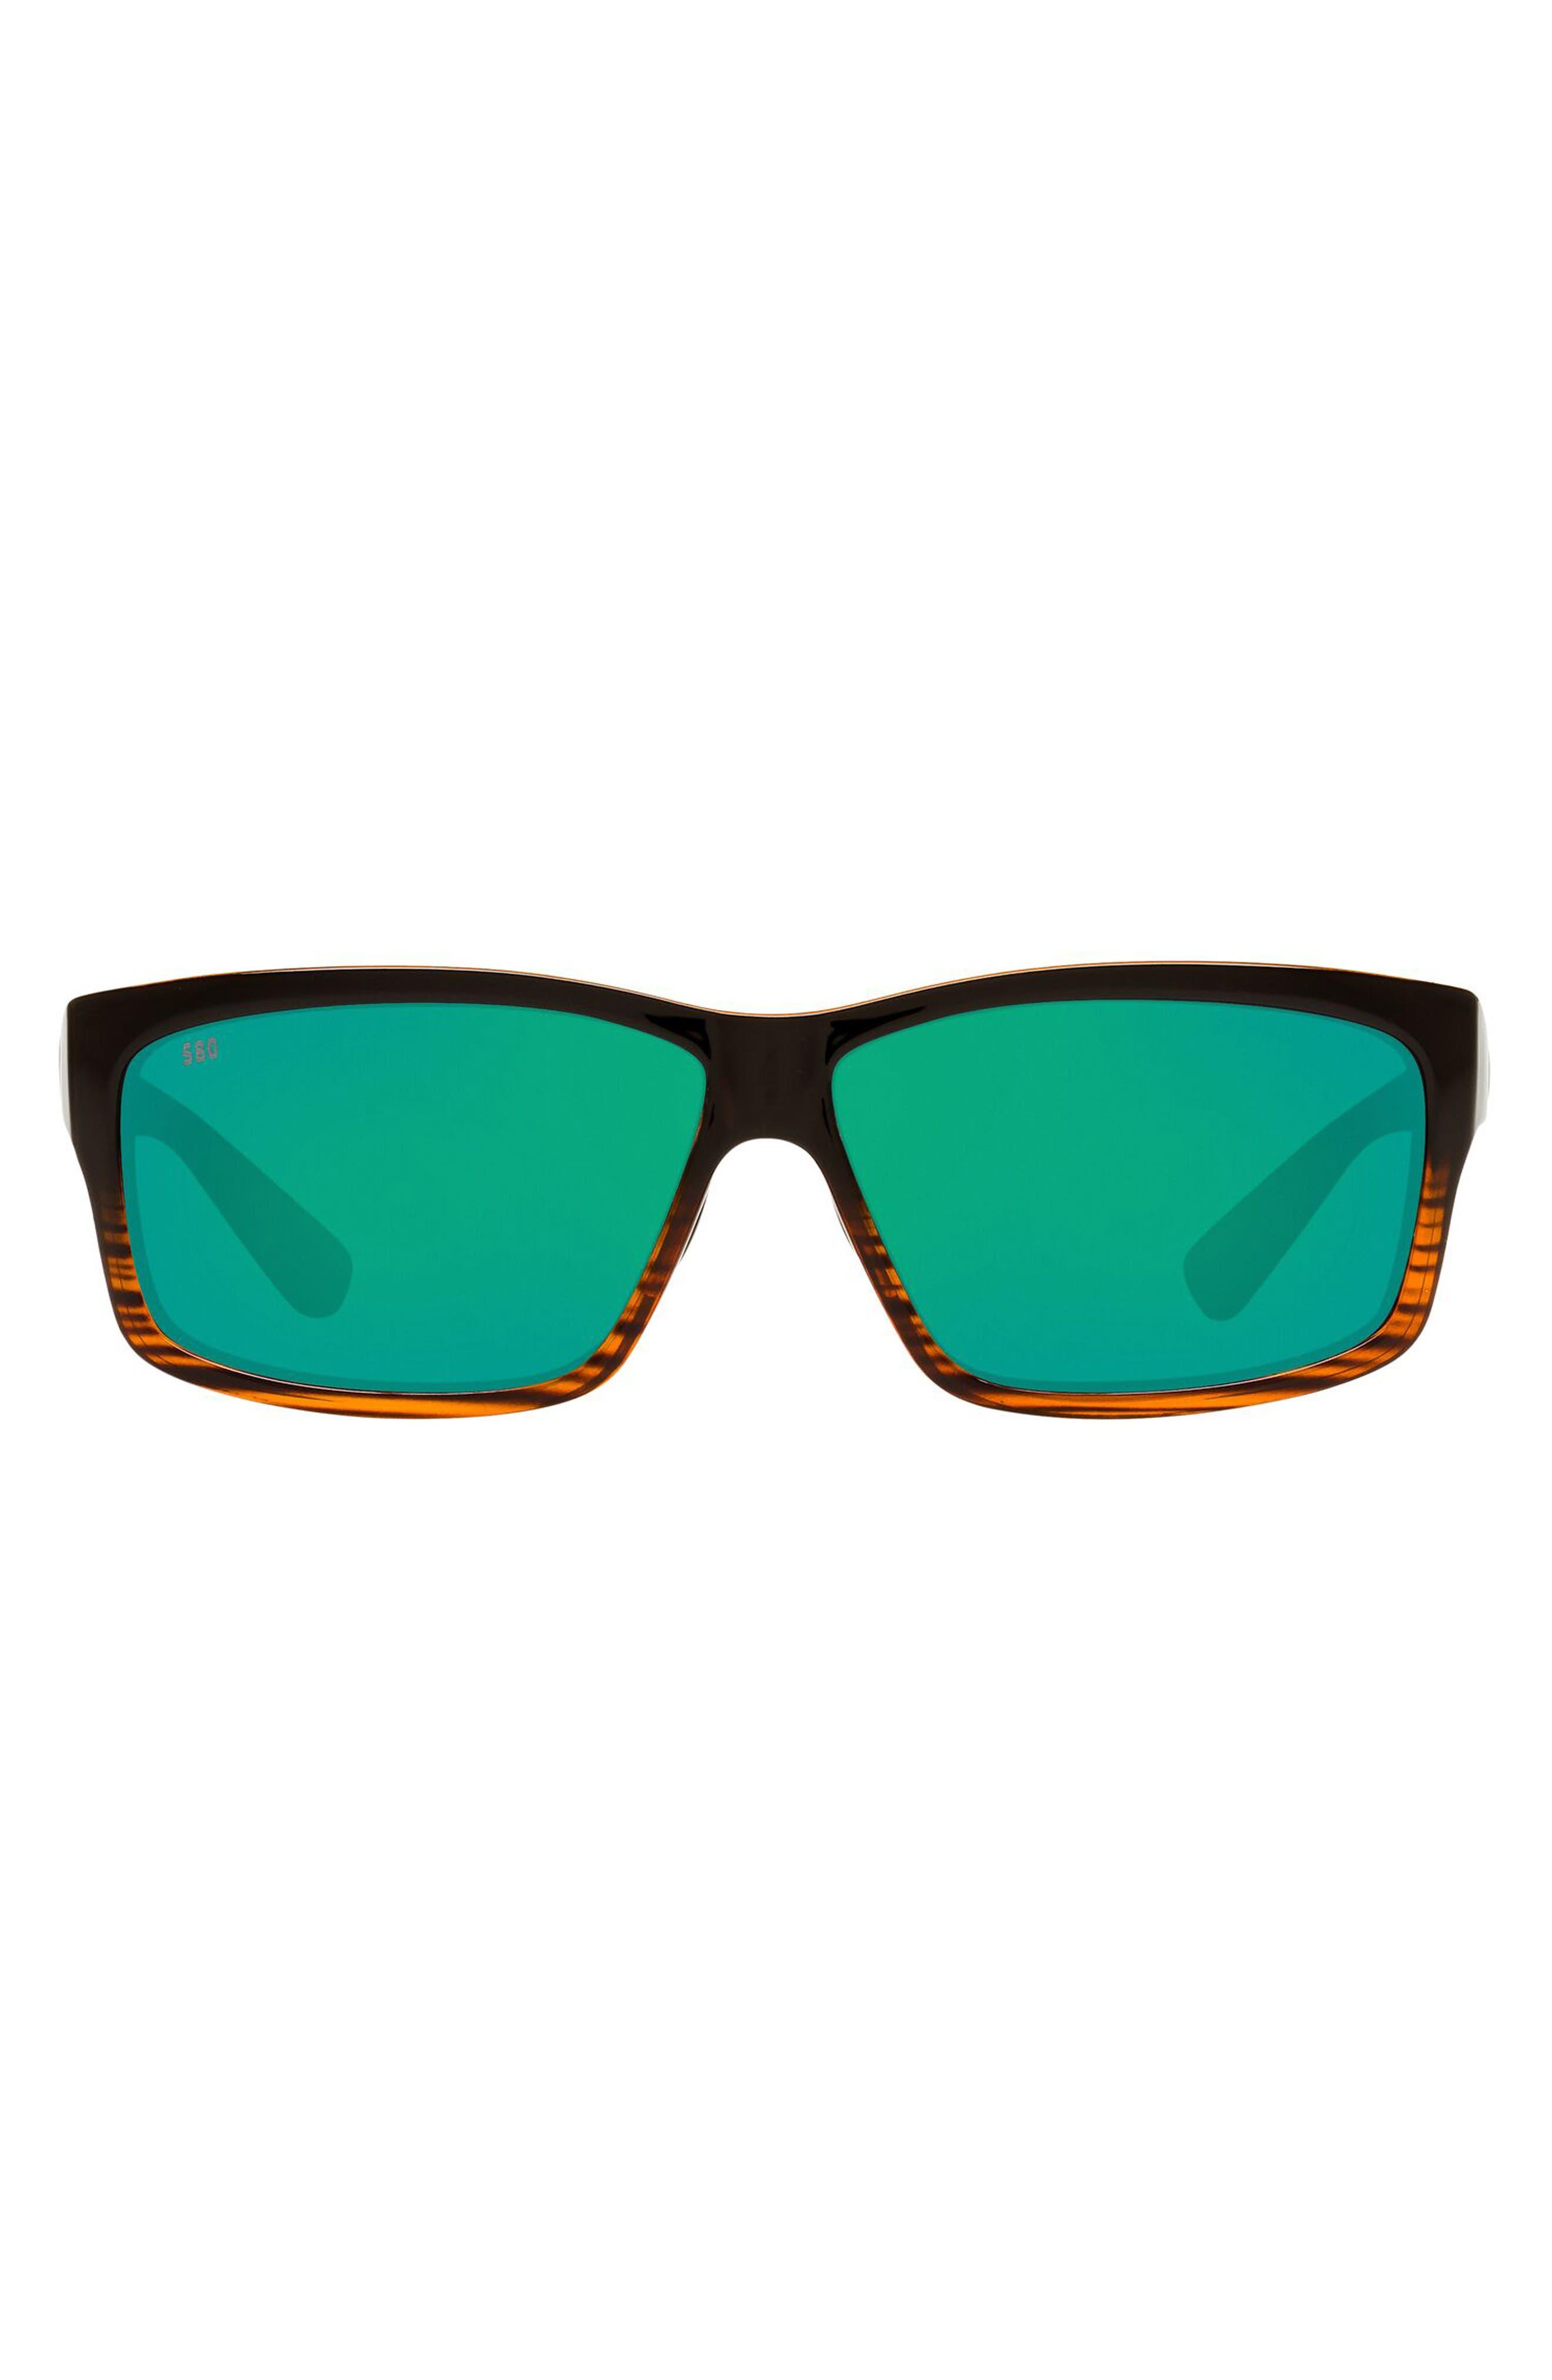 60mm Rectangle Sunglasses